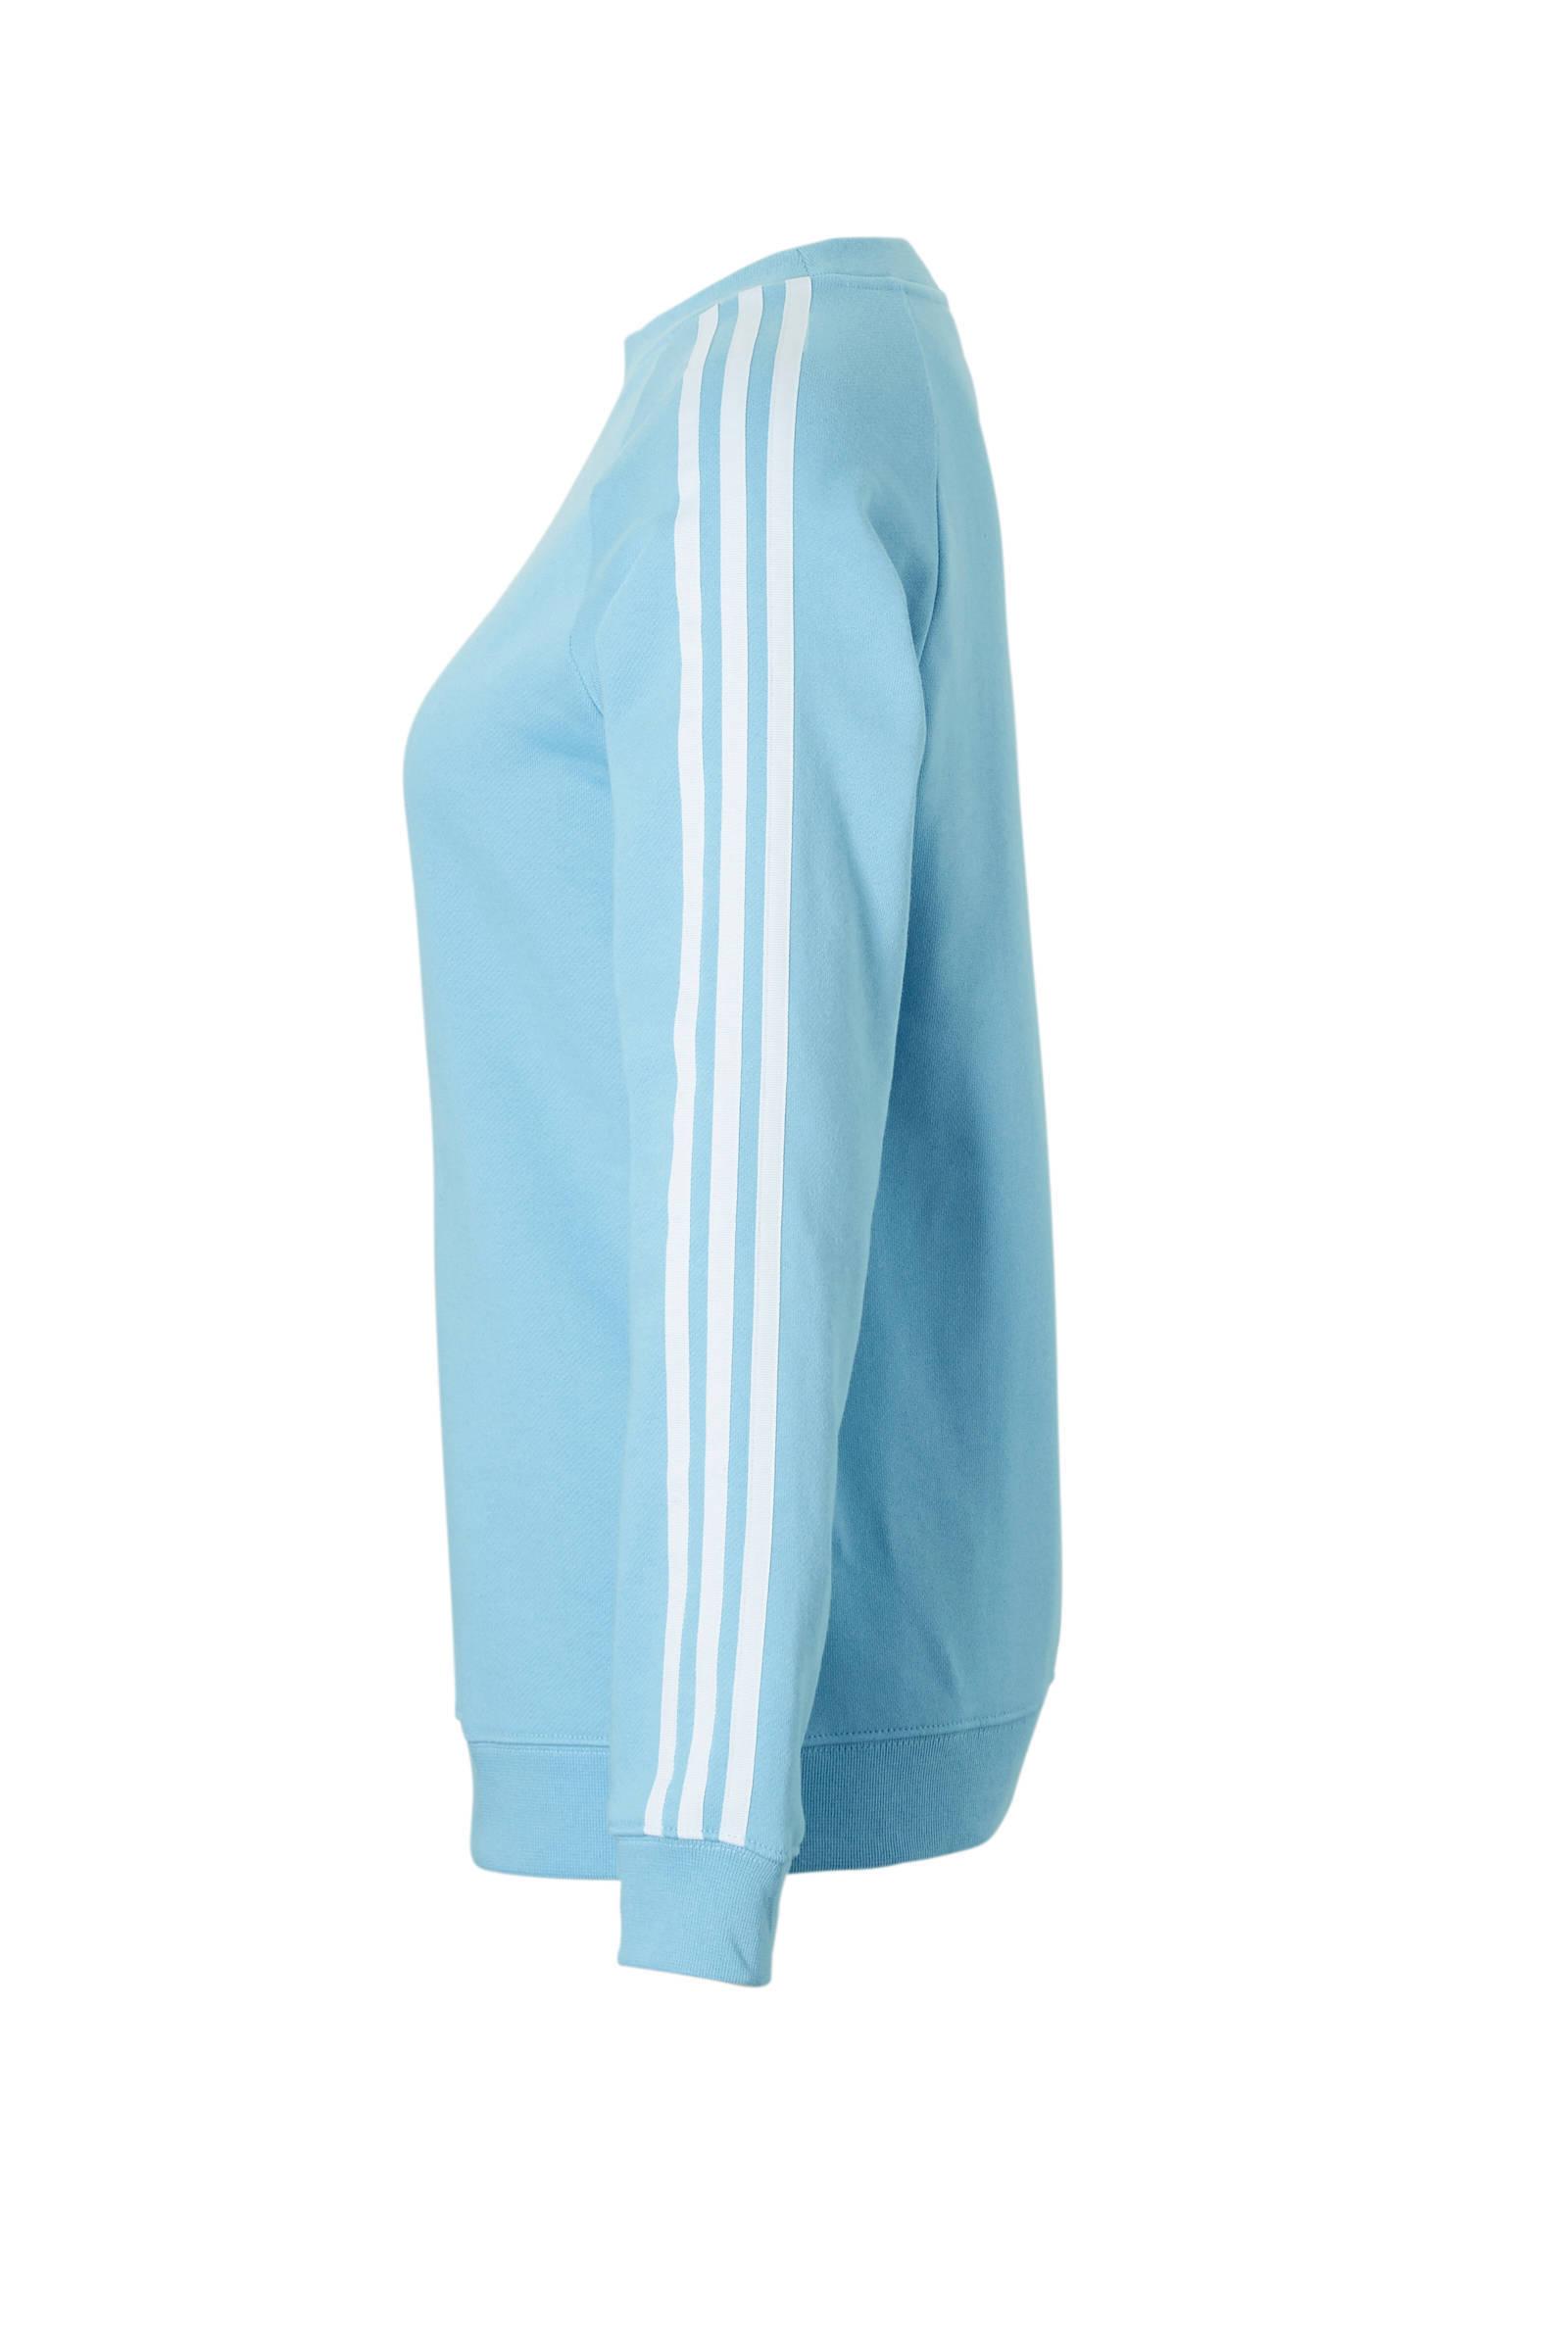 adidas Originals sweater lichtblauw | wehkamp